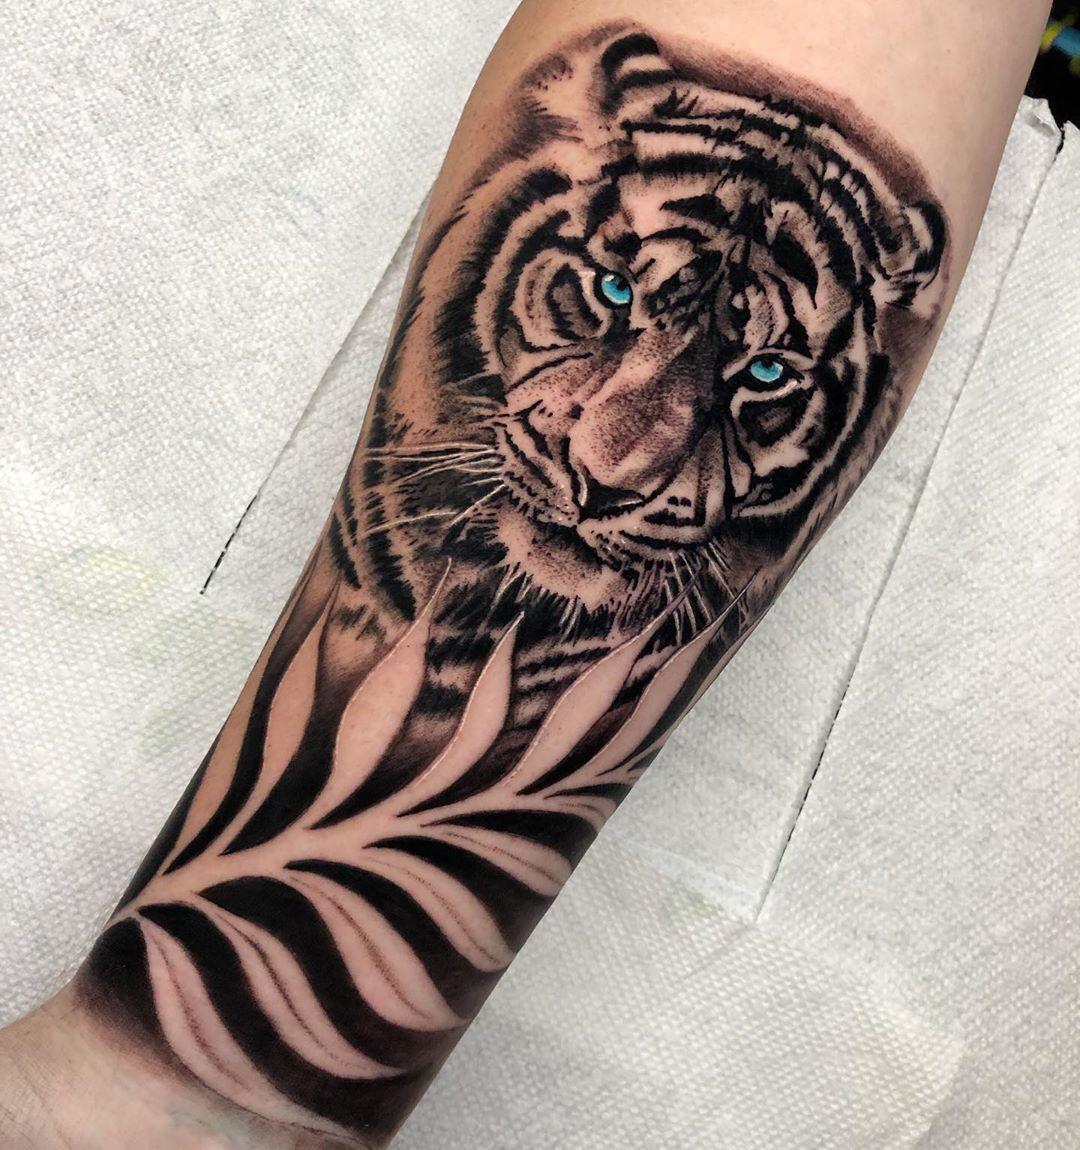 White Tiger Tattoo Tattoo Ideas And Inspiration White Tiger Tattoo Tiger Tattoo Design Tiger Tattoo